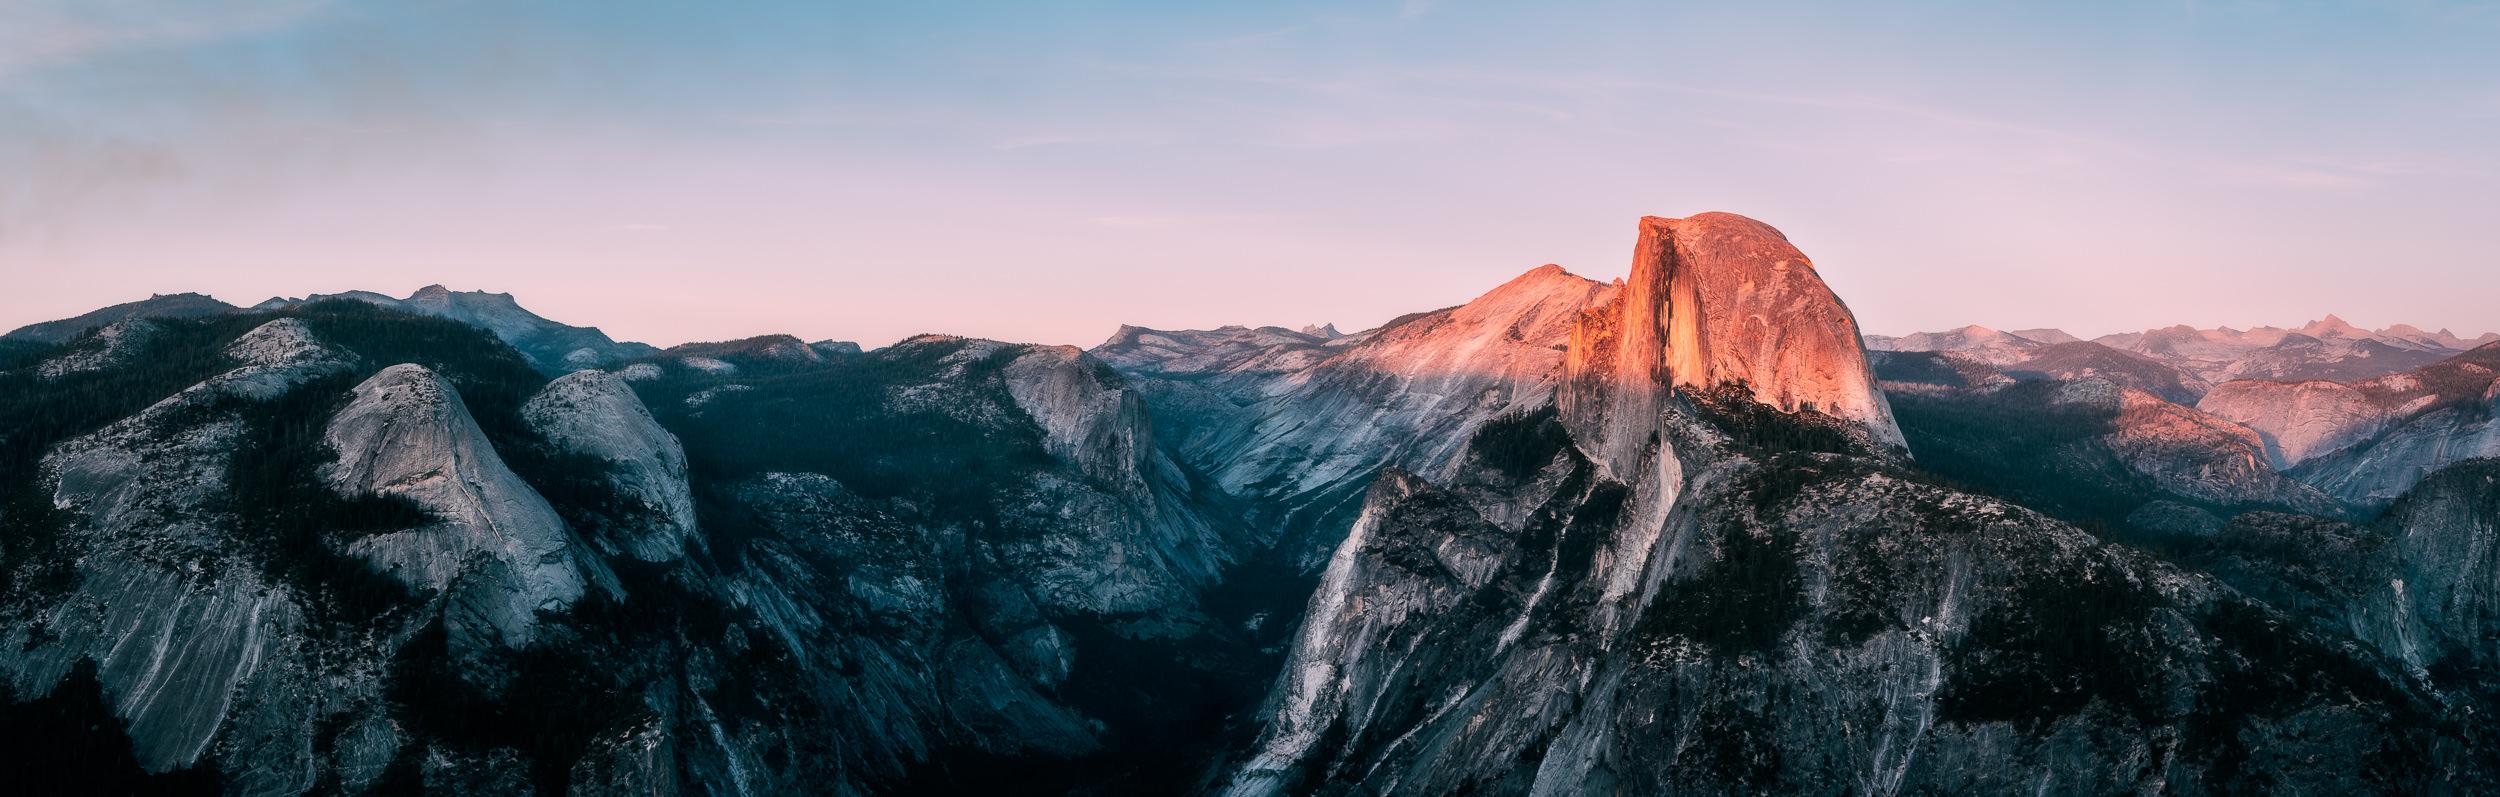 2018.09.26_Yosemite_Day1-6205-Pano-Edit.jpg